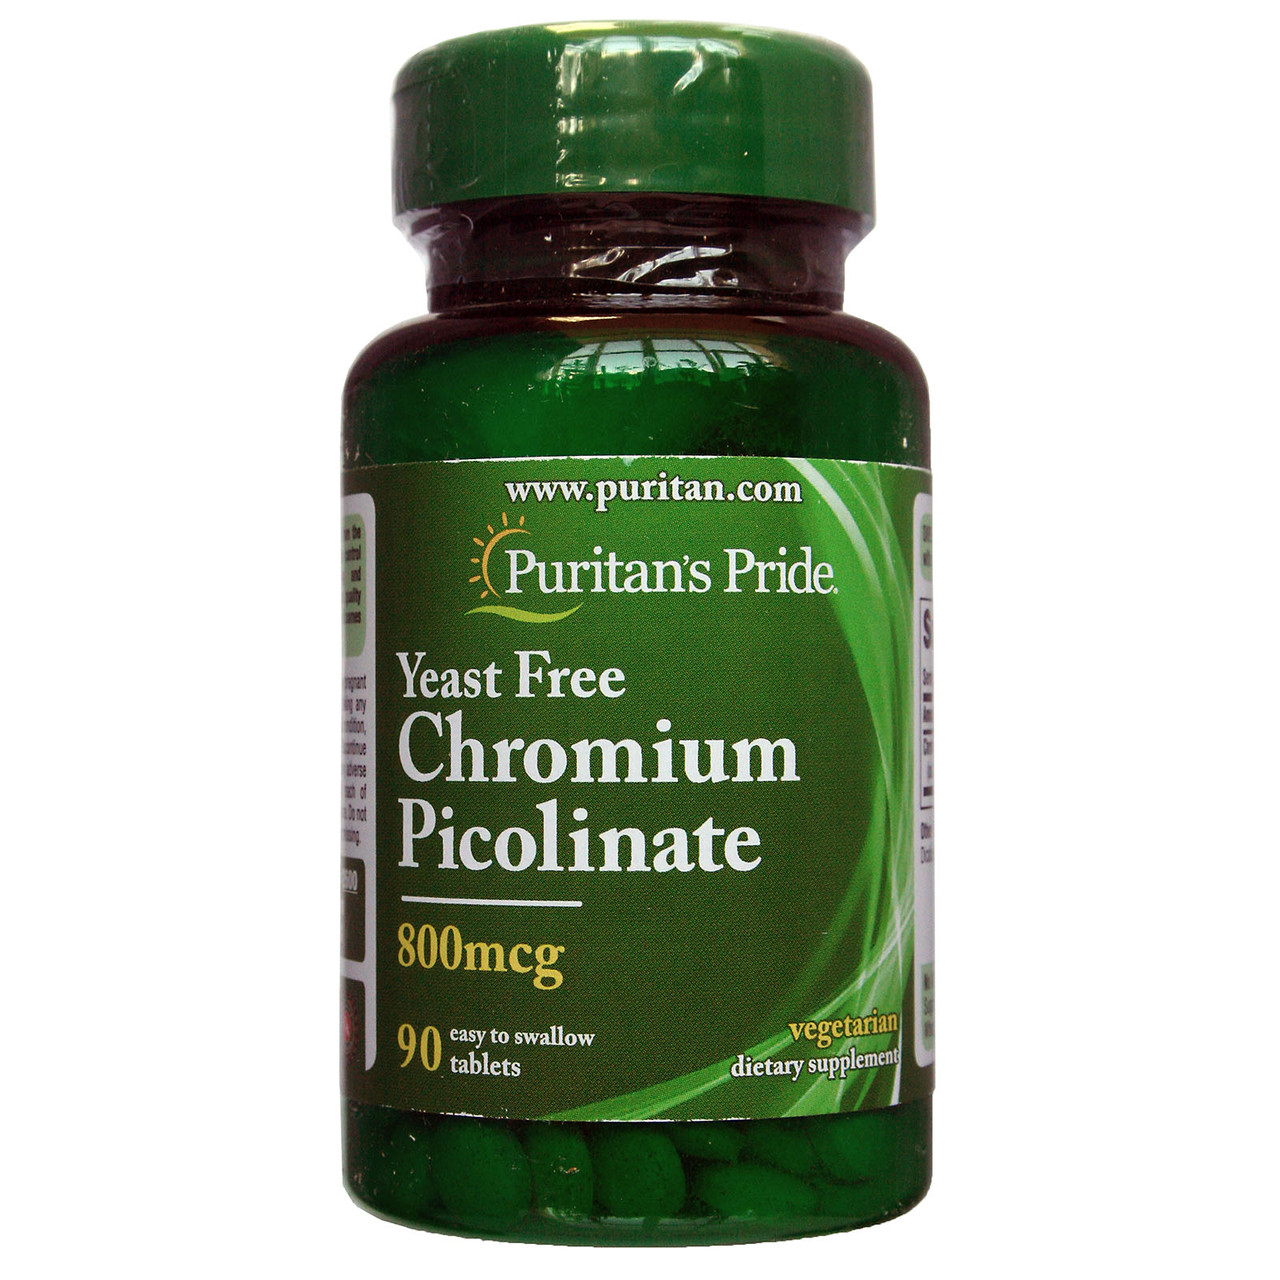 Пиколинат Хрома, Chromium Picolinate 800 mcg, Puritan's Pride, 90 таблеток